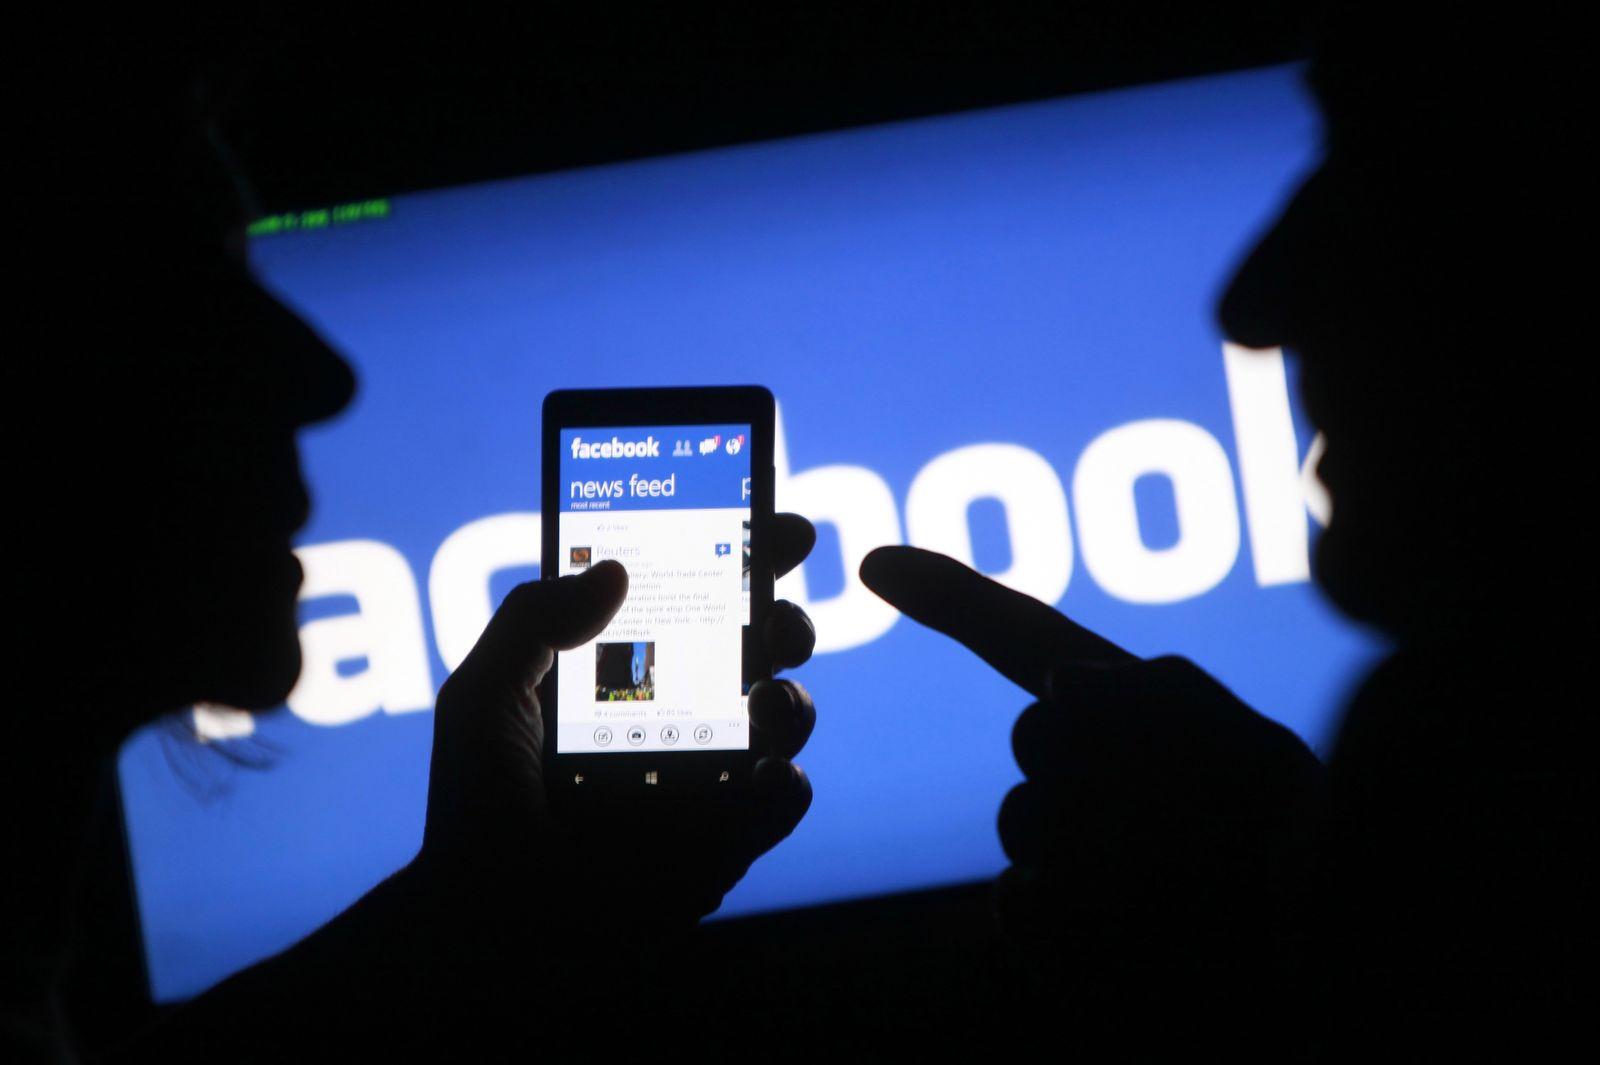 Facebook / Smartphone App